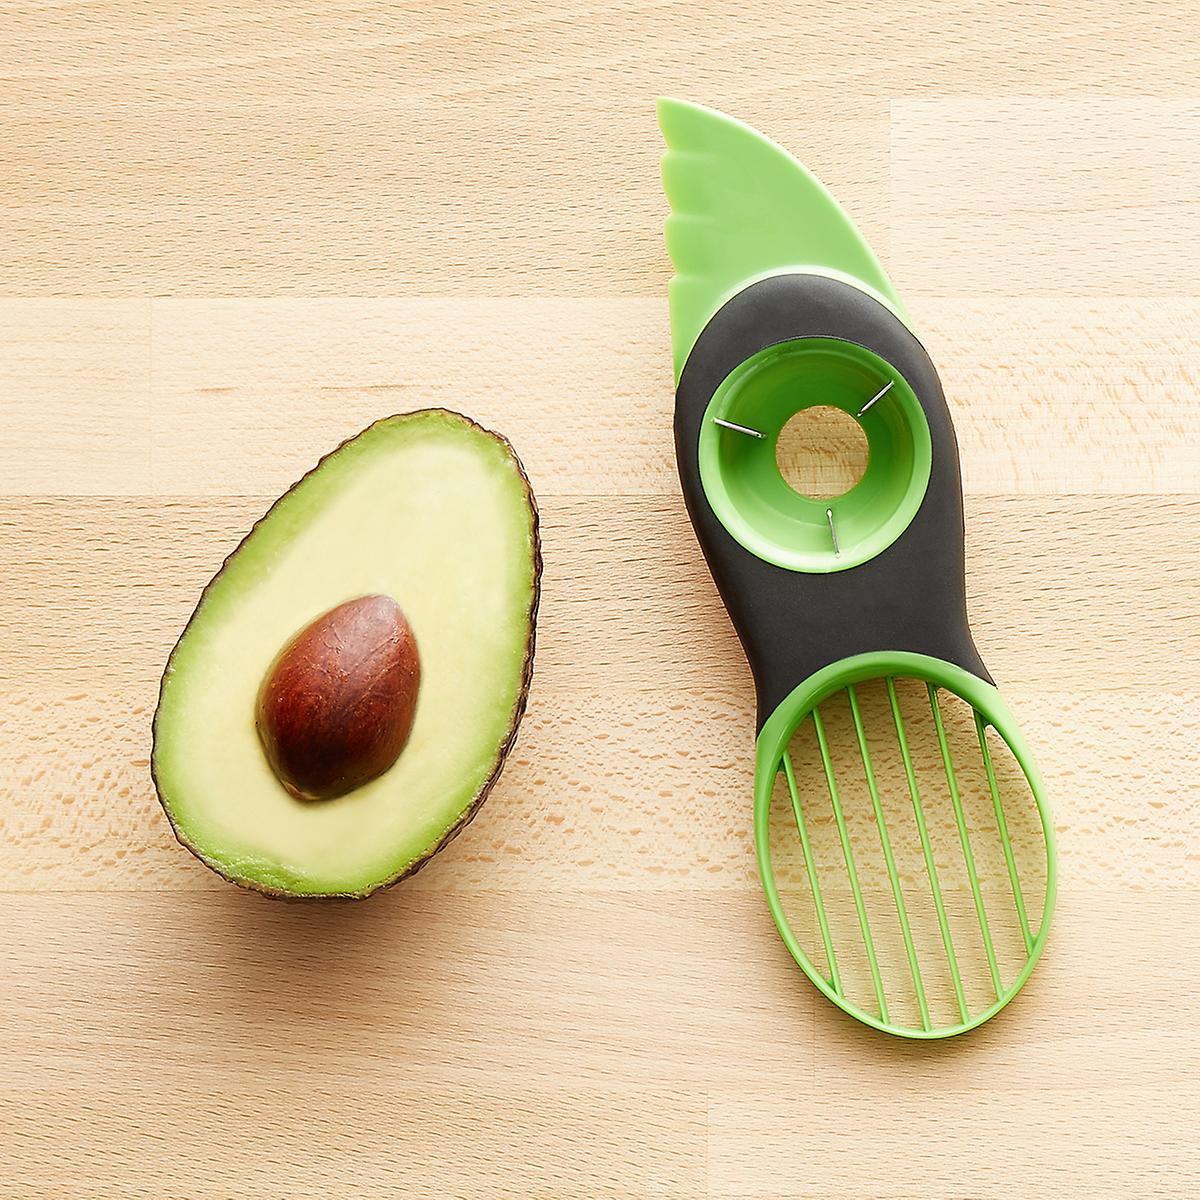 OXO Good Grips 3-In-1 Avocado Tool